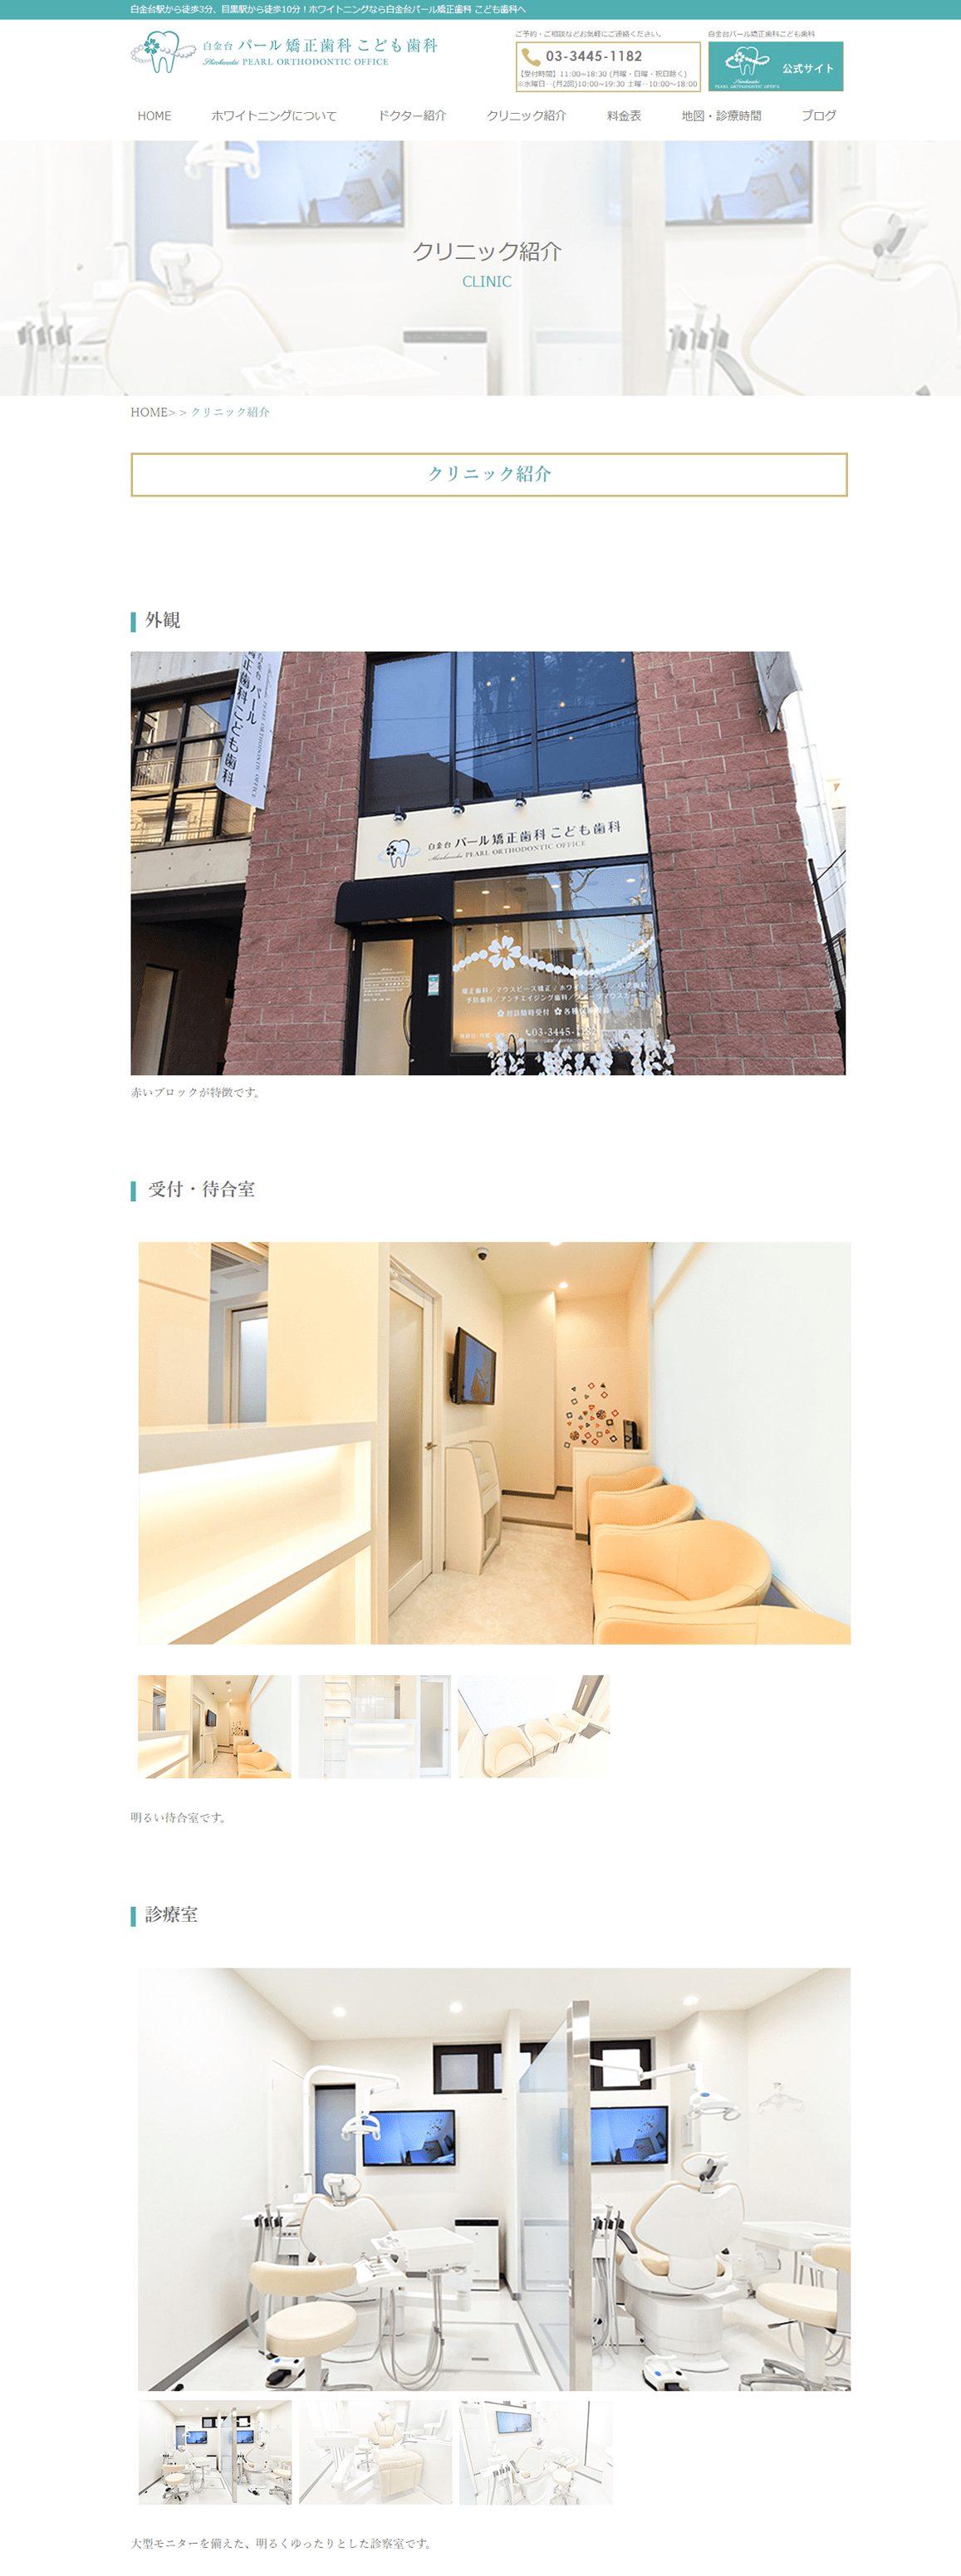 pearlwhite-dentalclinic.com_toure_クリニックについて-min-min